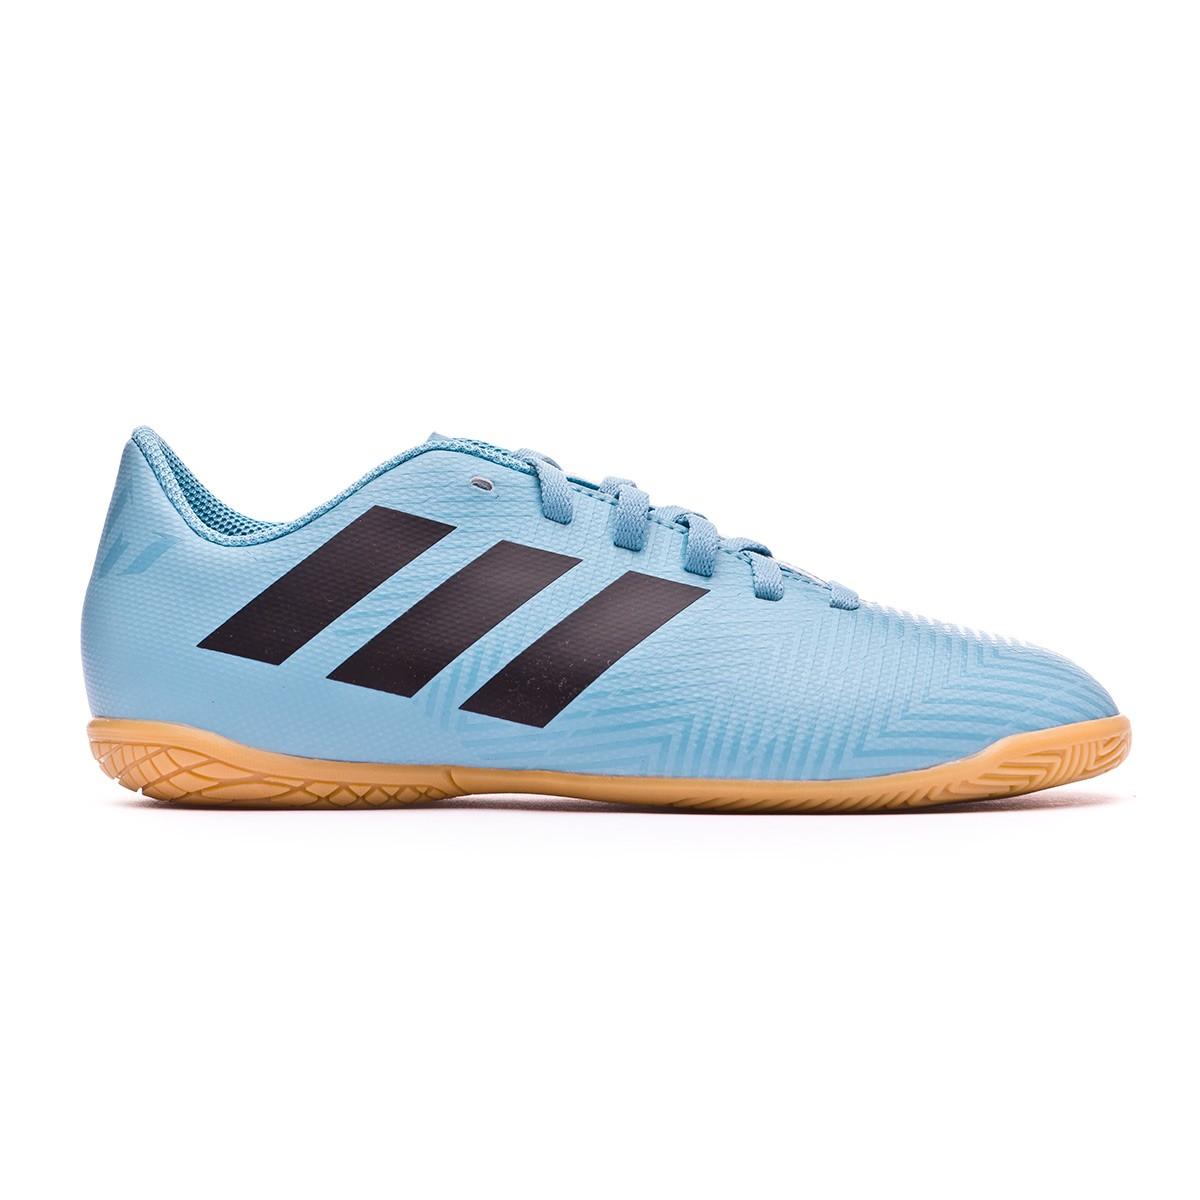 Sapatilha de Futsal adidas Nemeziz Messi Tango 18.4 IN Crianças